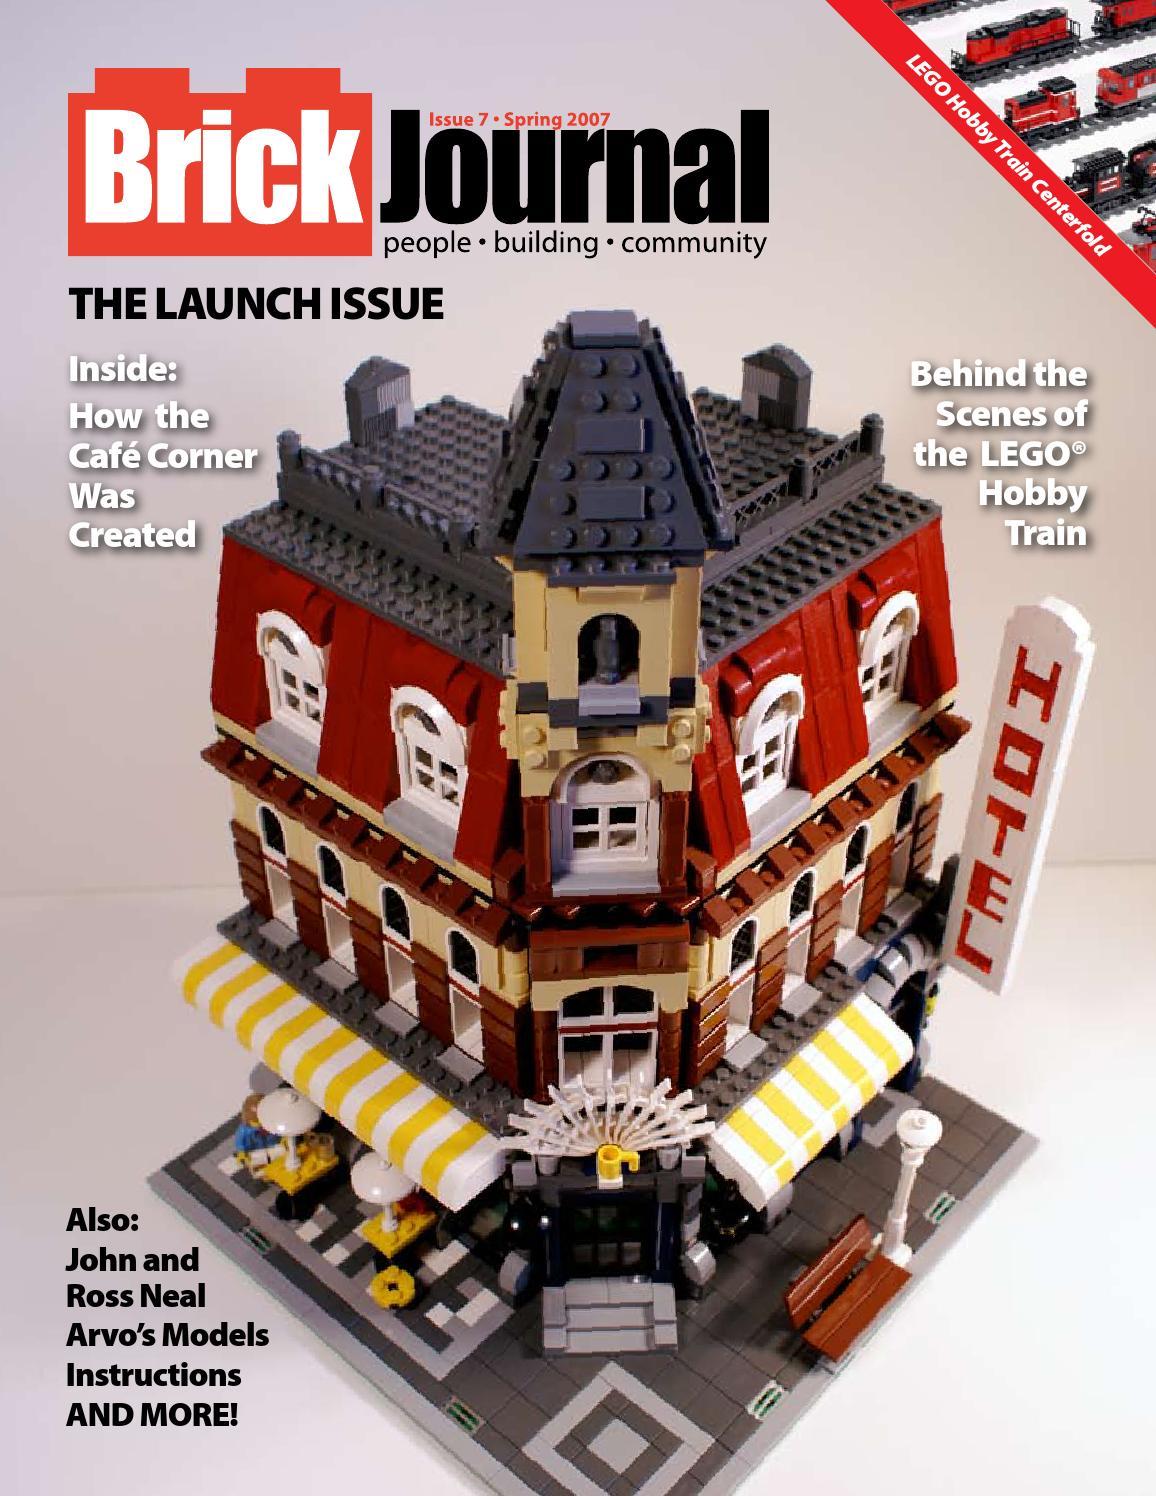 Lego 1x4 White Tile Smooth Finishing Flat 1 x 4 Modular Buildings Bricks 25 Pcs